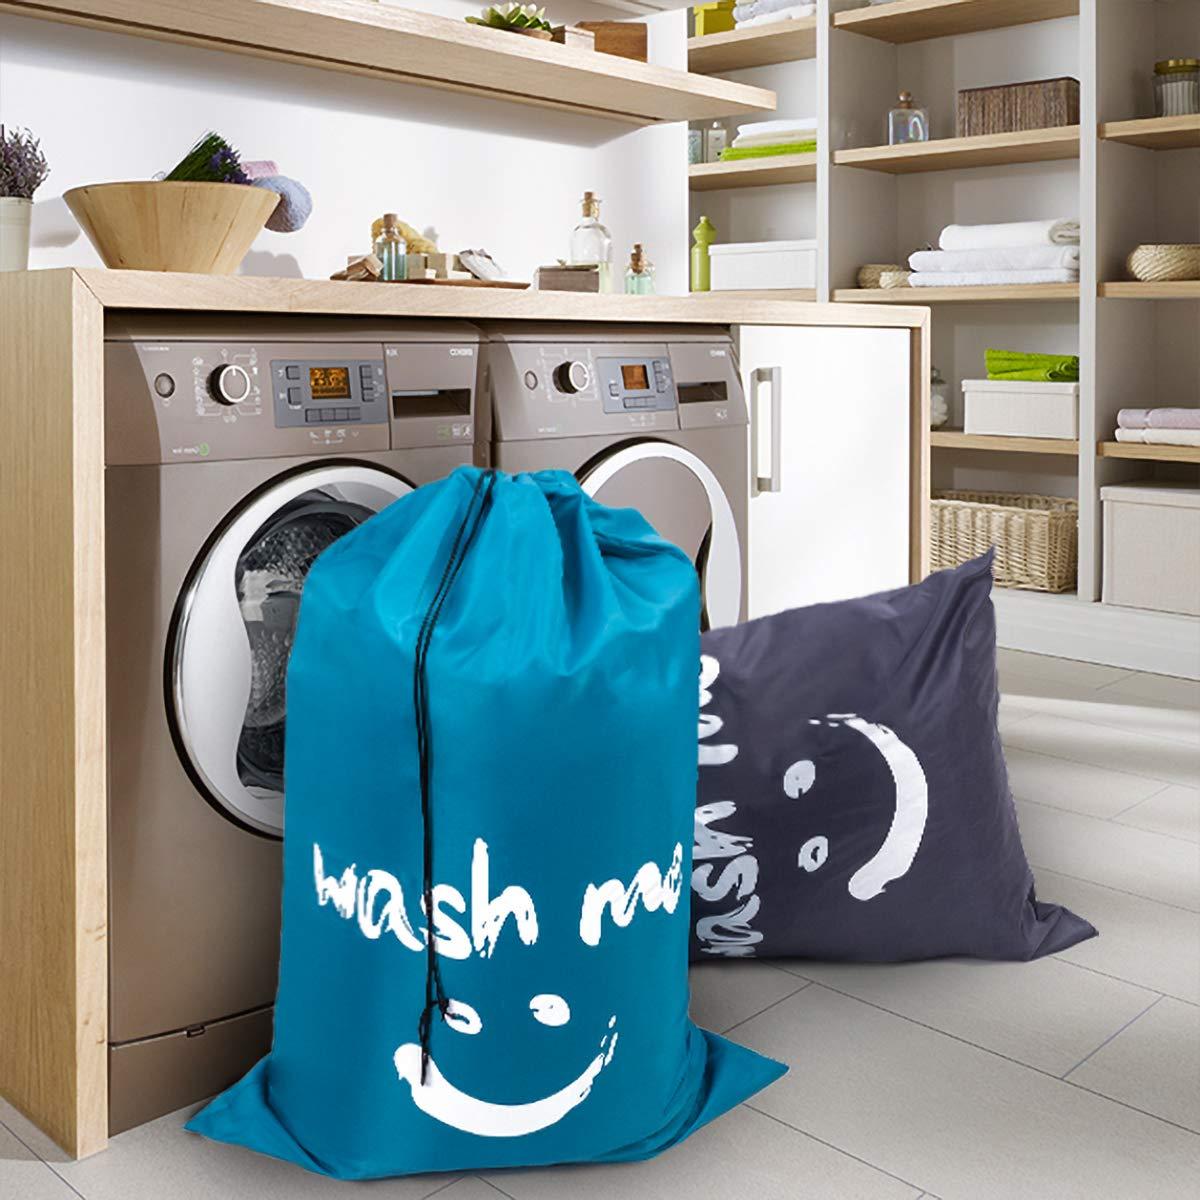 ZERO JET LAG 2 Pack Extra Large Travel Laundry Bag Set Nylon Rip-Stop Dirty Storage Bag Machine Washable Drawstring Closure 24'' x 36'' (Blue and Gray) by ZERO JET LAG (Image #7)